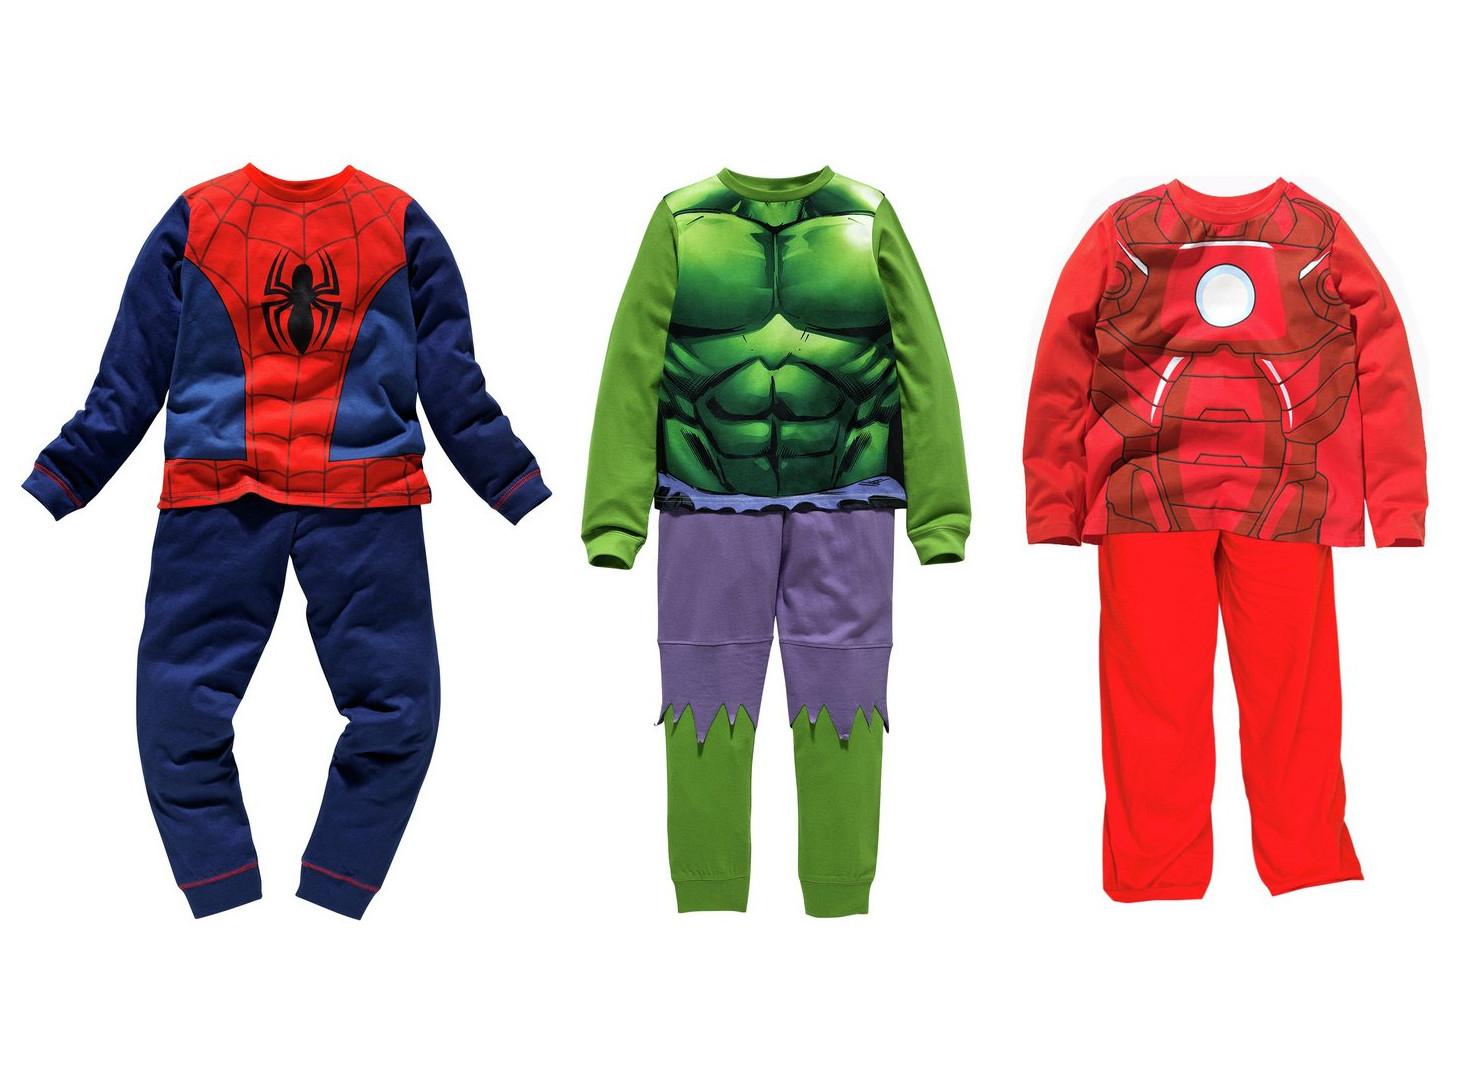 Kids Spider-Man, Hulk or Iron Man Cotton Novelty Pyjamas now £6.49 @ Argos